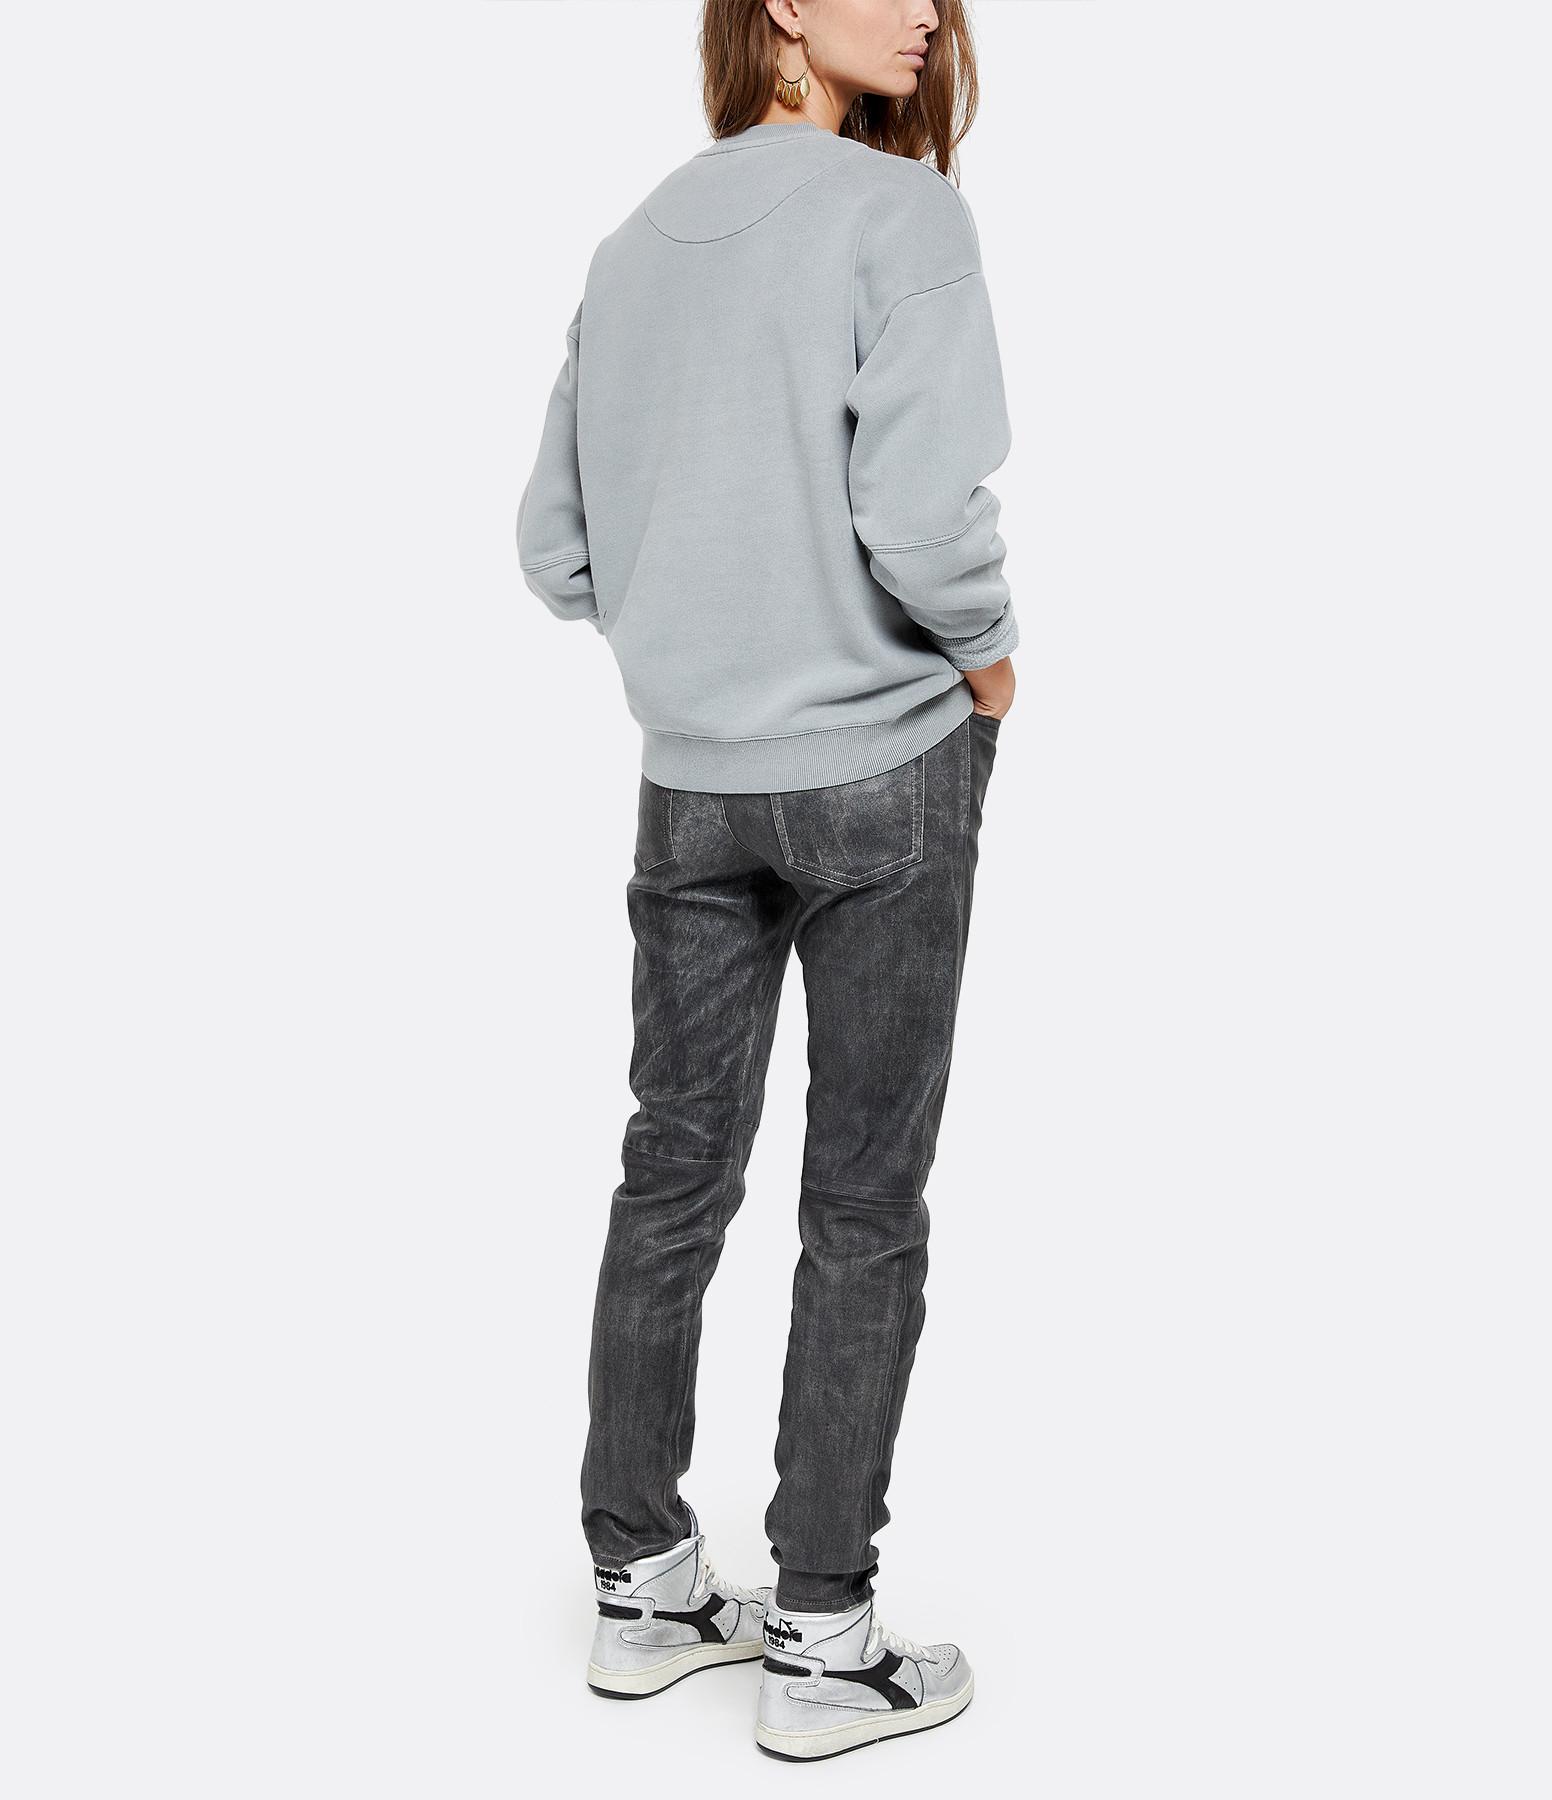 NEWTONE - Sweatshirt Roller Kiss Me Coton Gris